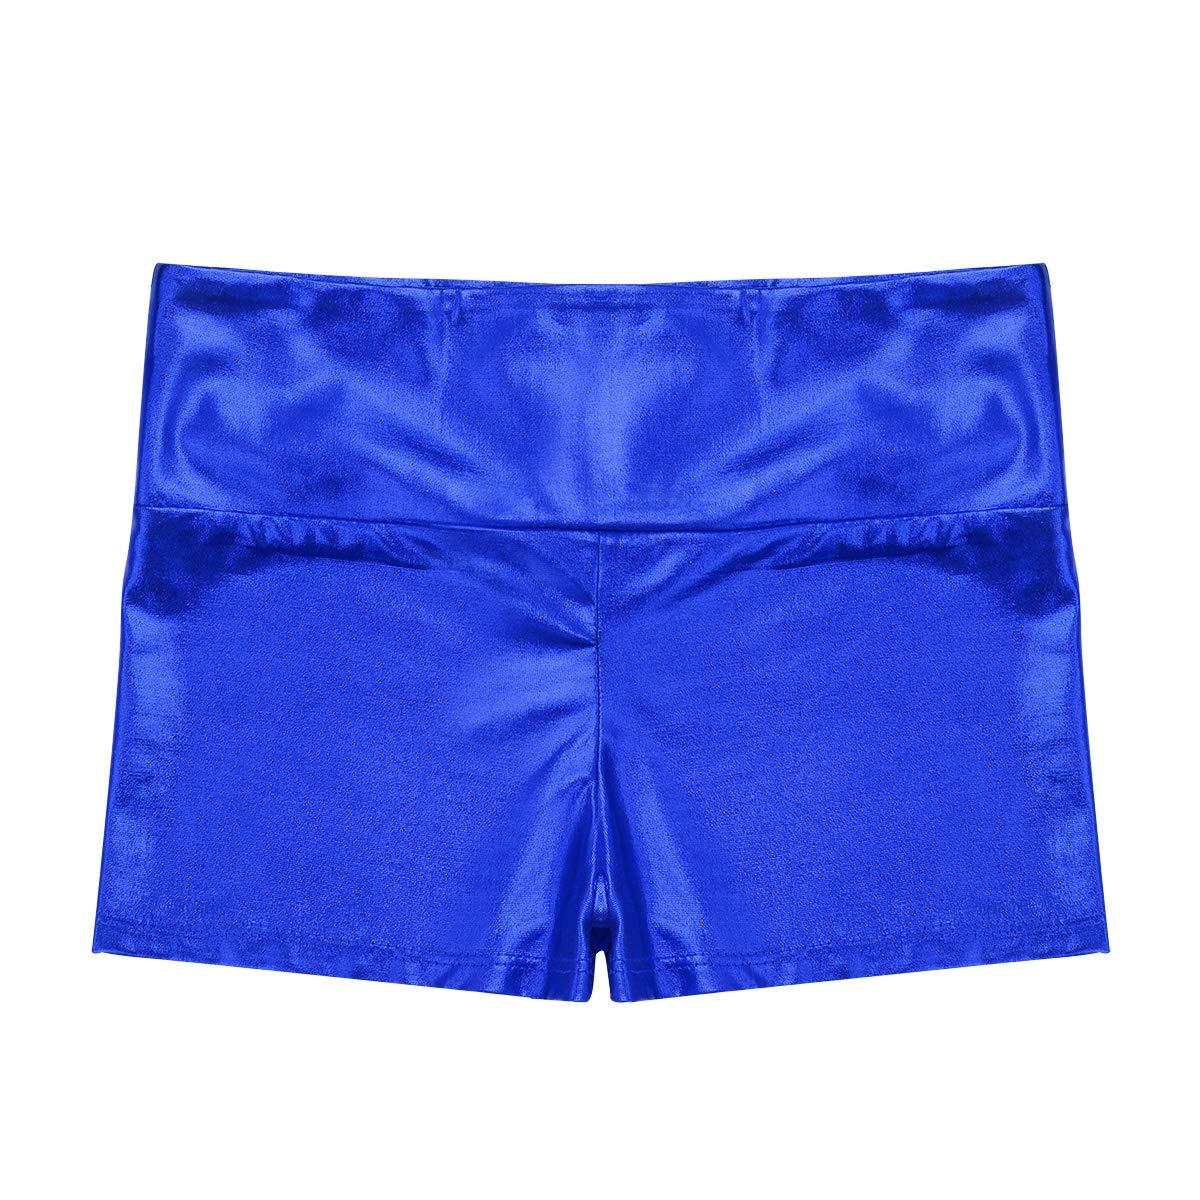 YiZYiF Girls Youth High Waist Stretchy Gymnastics Basics Shiny Metallic Dance Booty Shorts